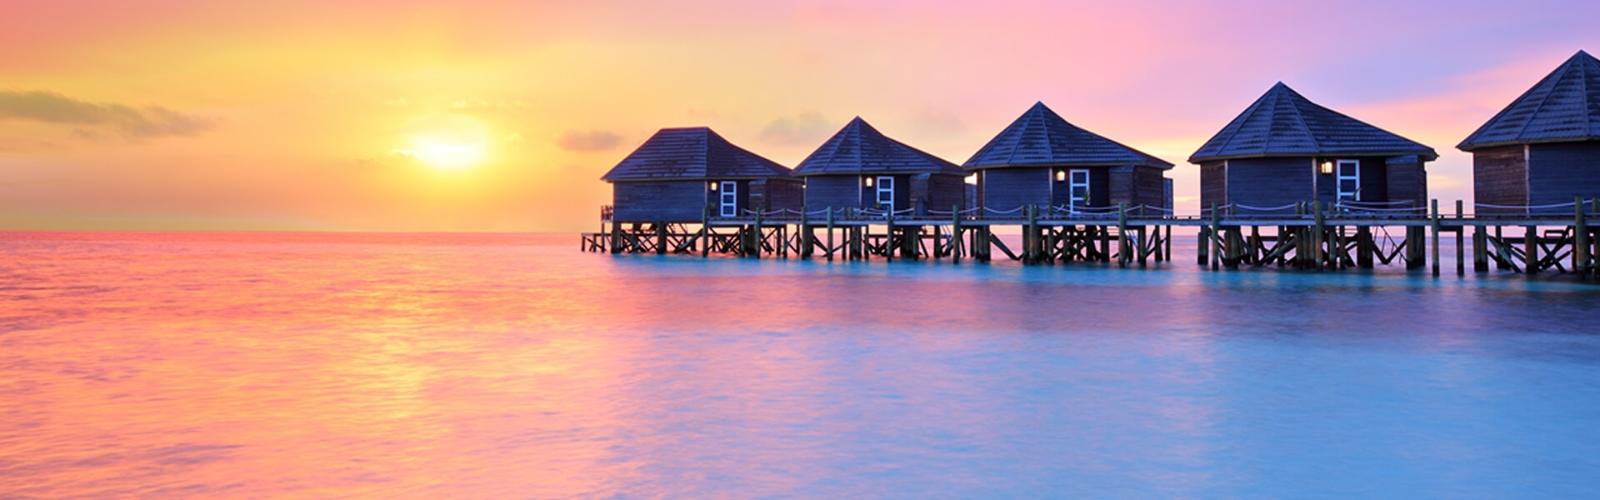 Maldives Holidays 2020 2021 Maldives All Inclusive